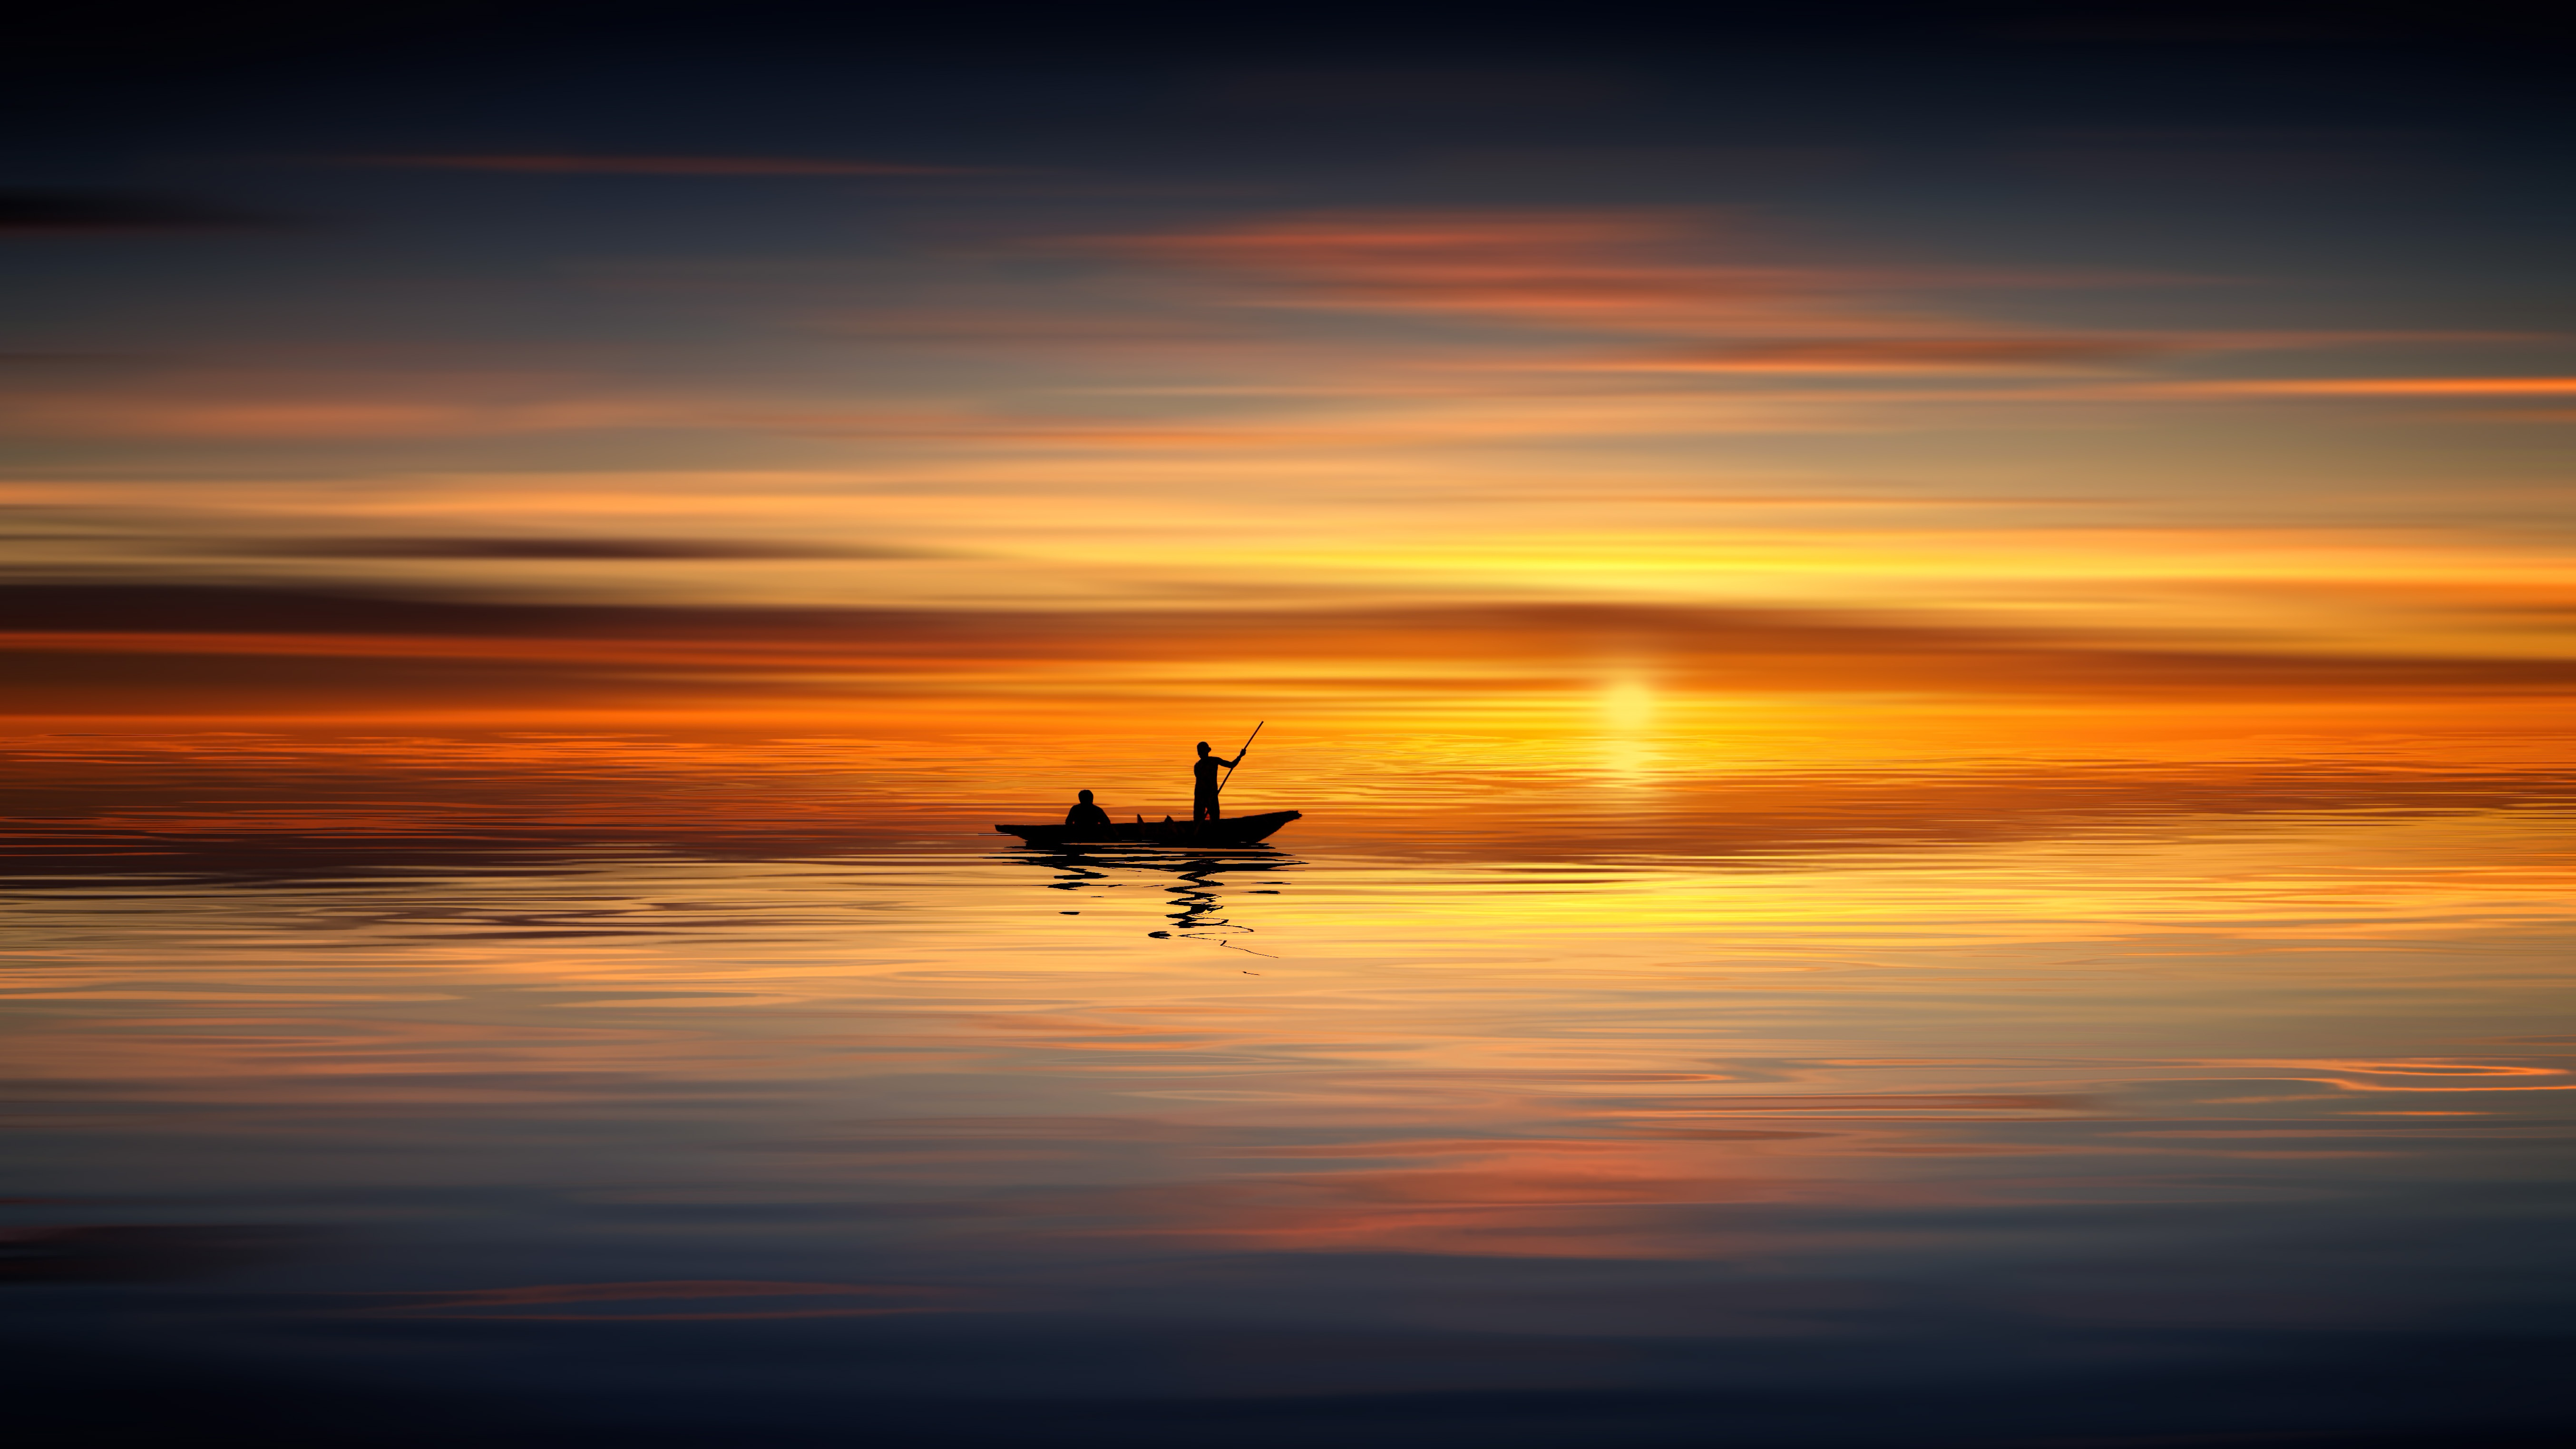 Sailing Sunset Boat Sea Ocean Nature Landscape HD POSTER